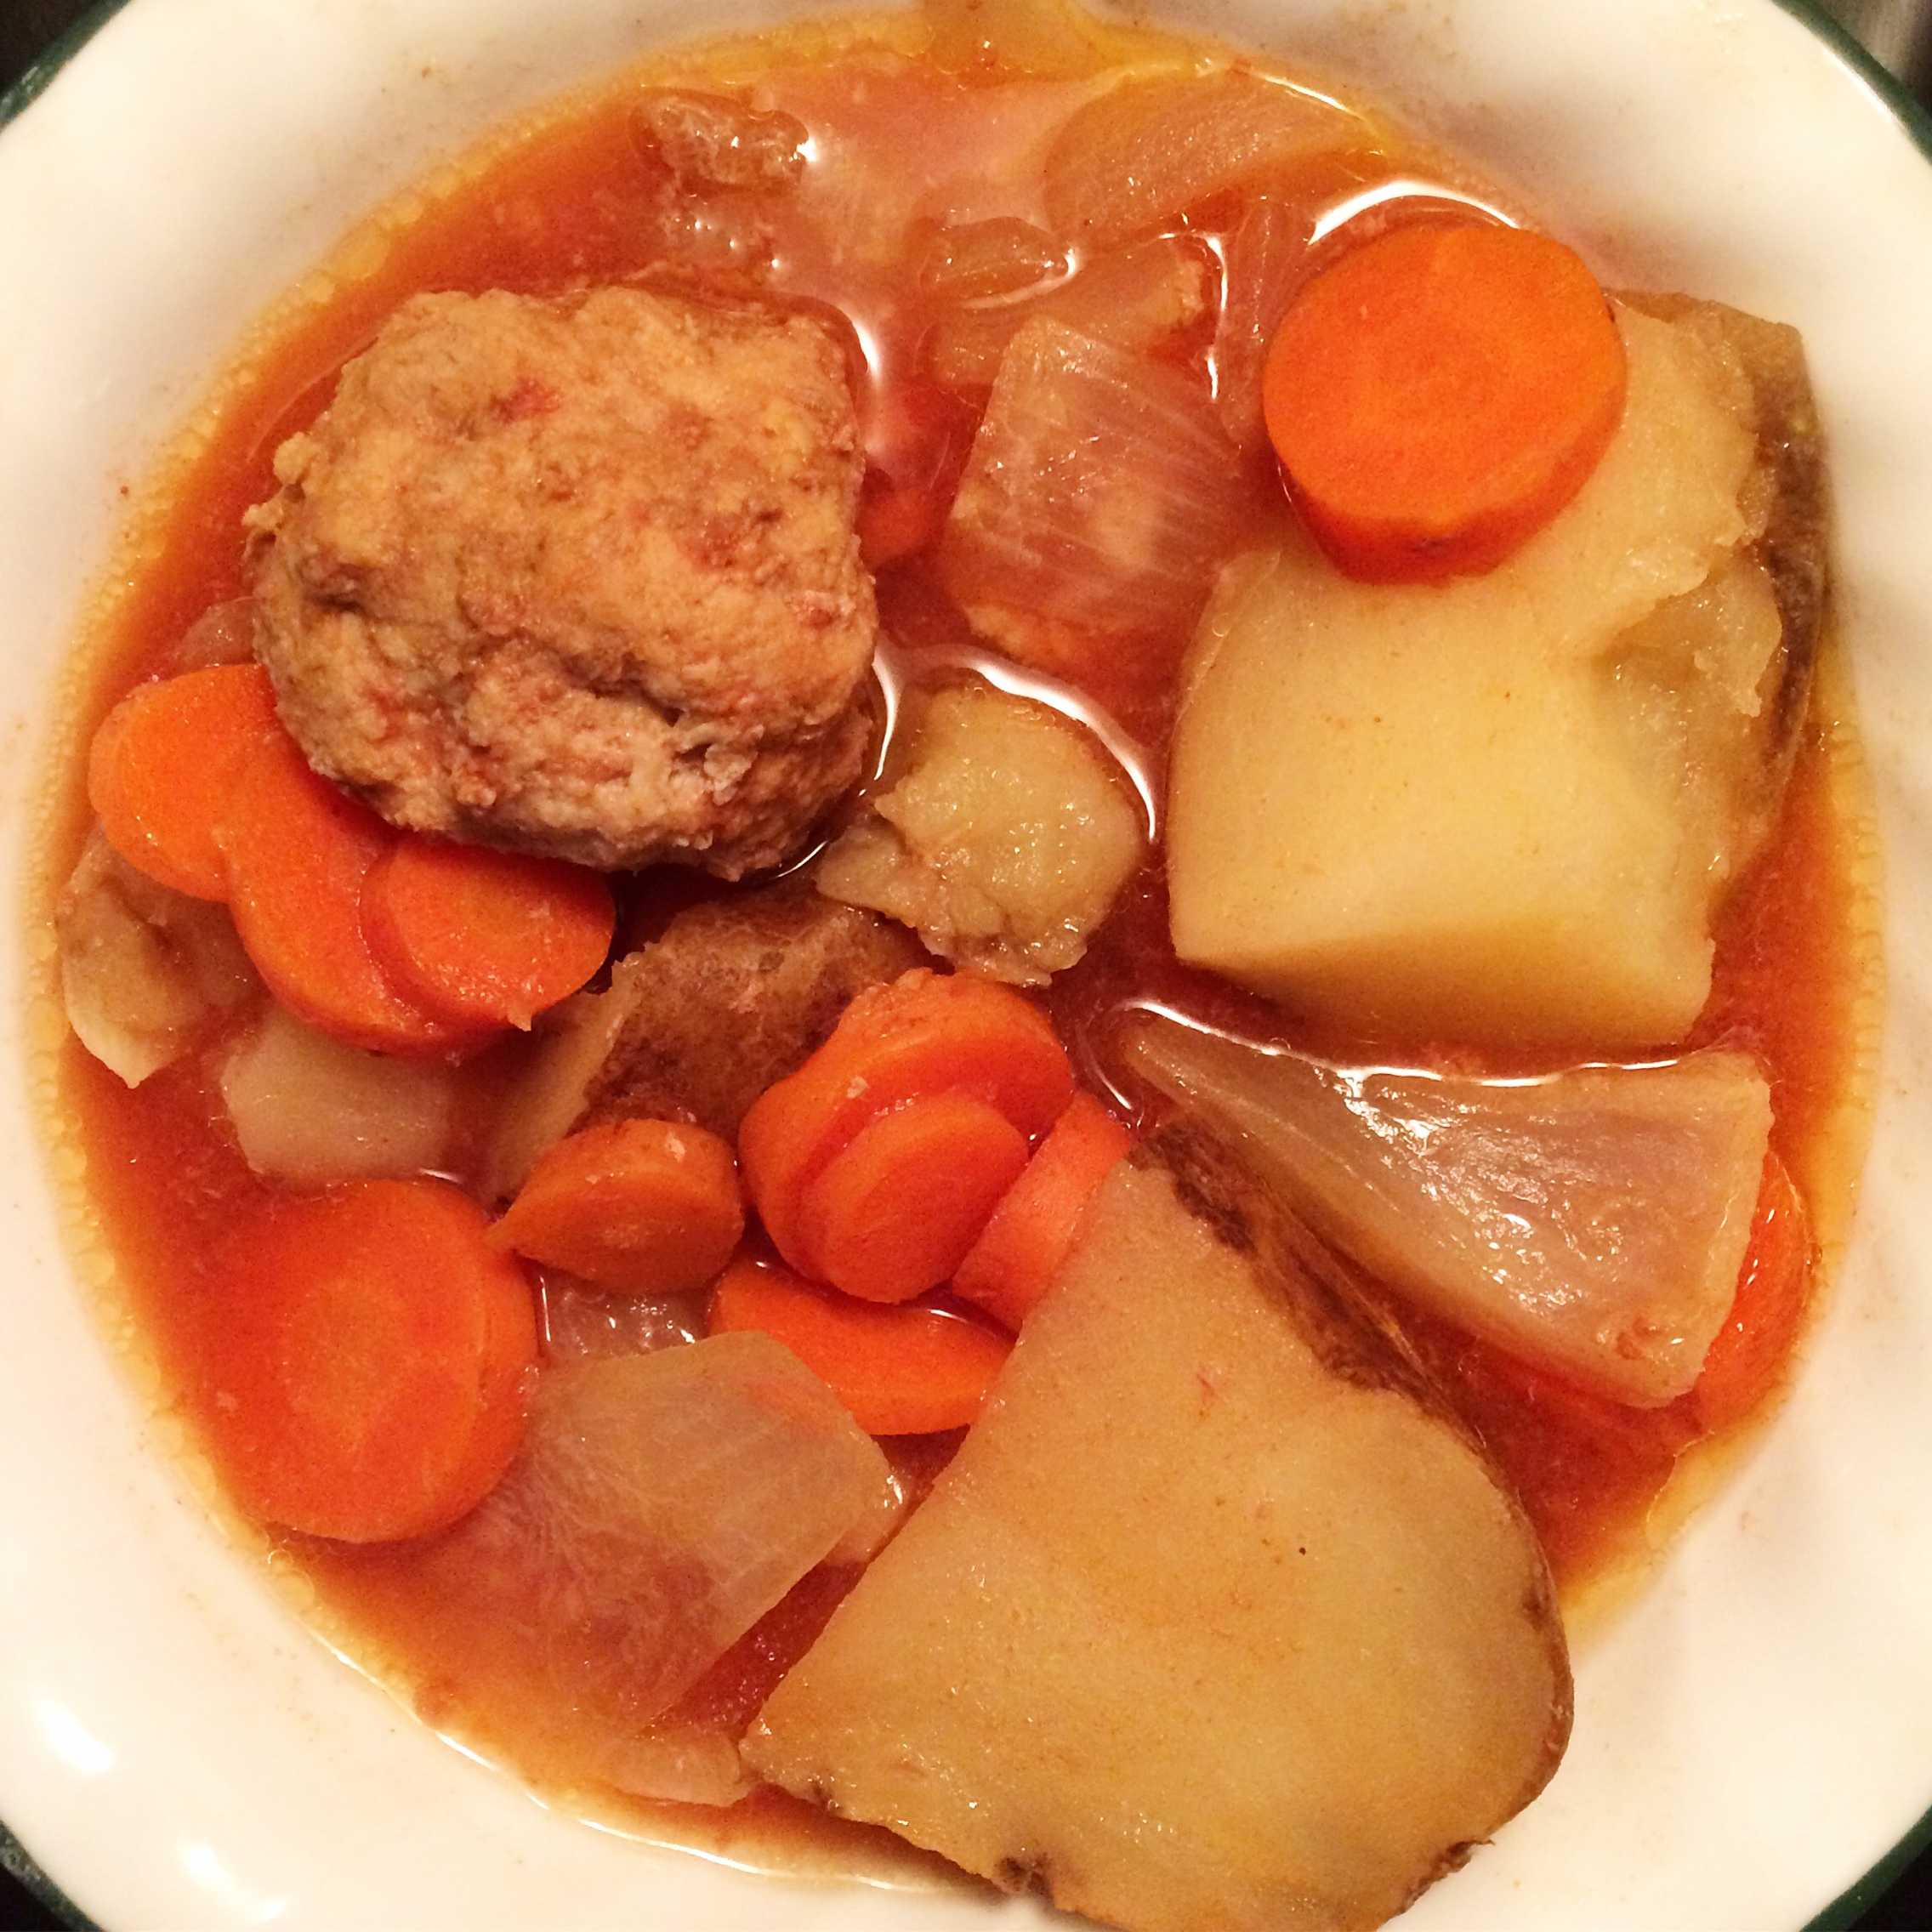 Caveman Stew